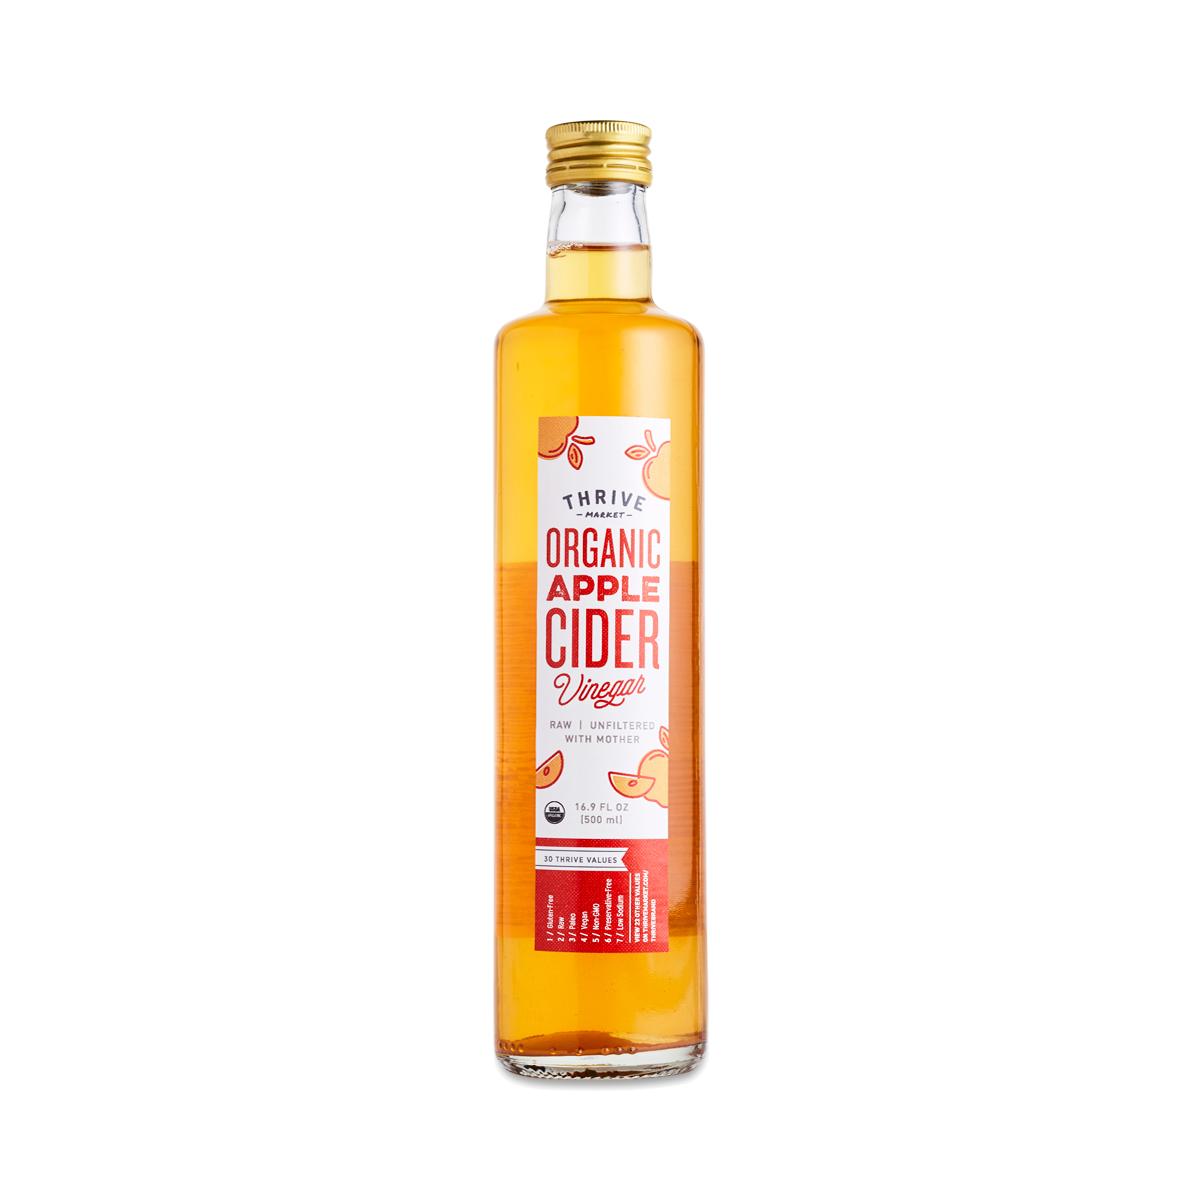 Organic Apple Cider Vinegar Thrive Market